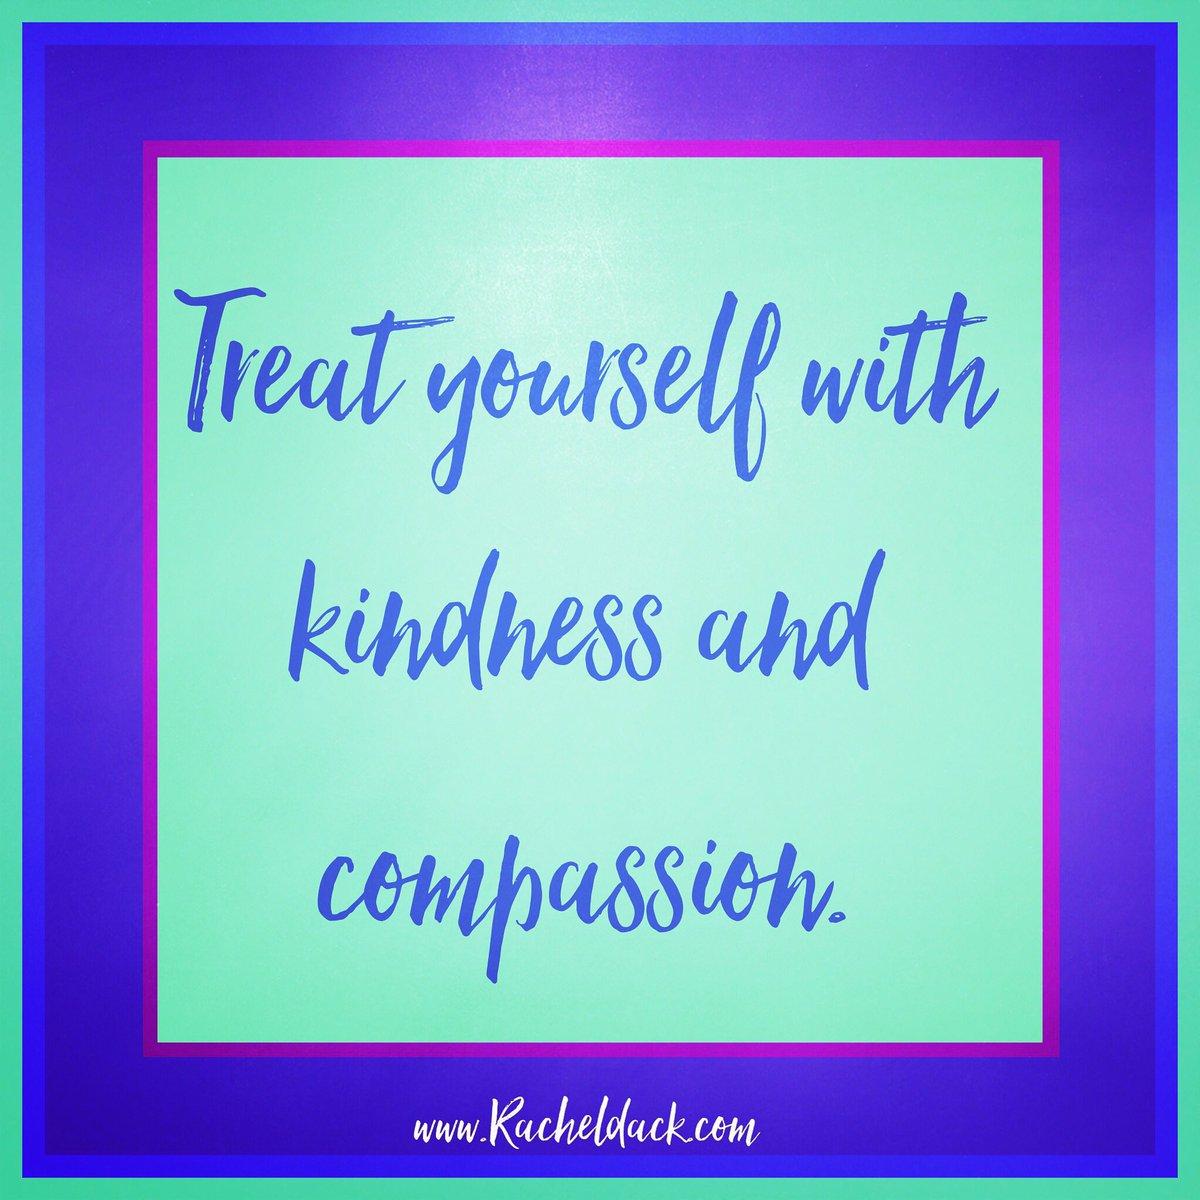 Be kind to yourself! #kindness #wednesdaywisdom #mentalhealth #selflove<br>http://pic.twitter.com/dVZBqX2kbs